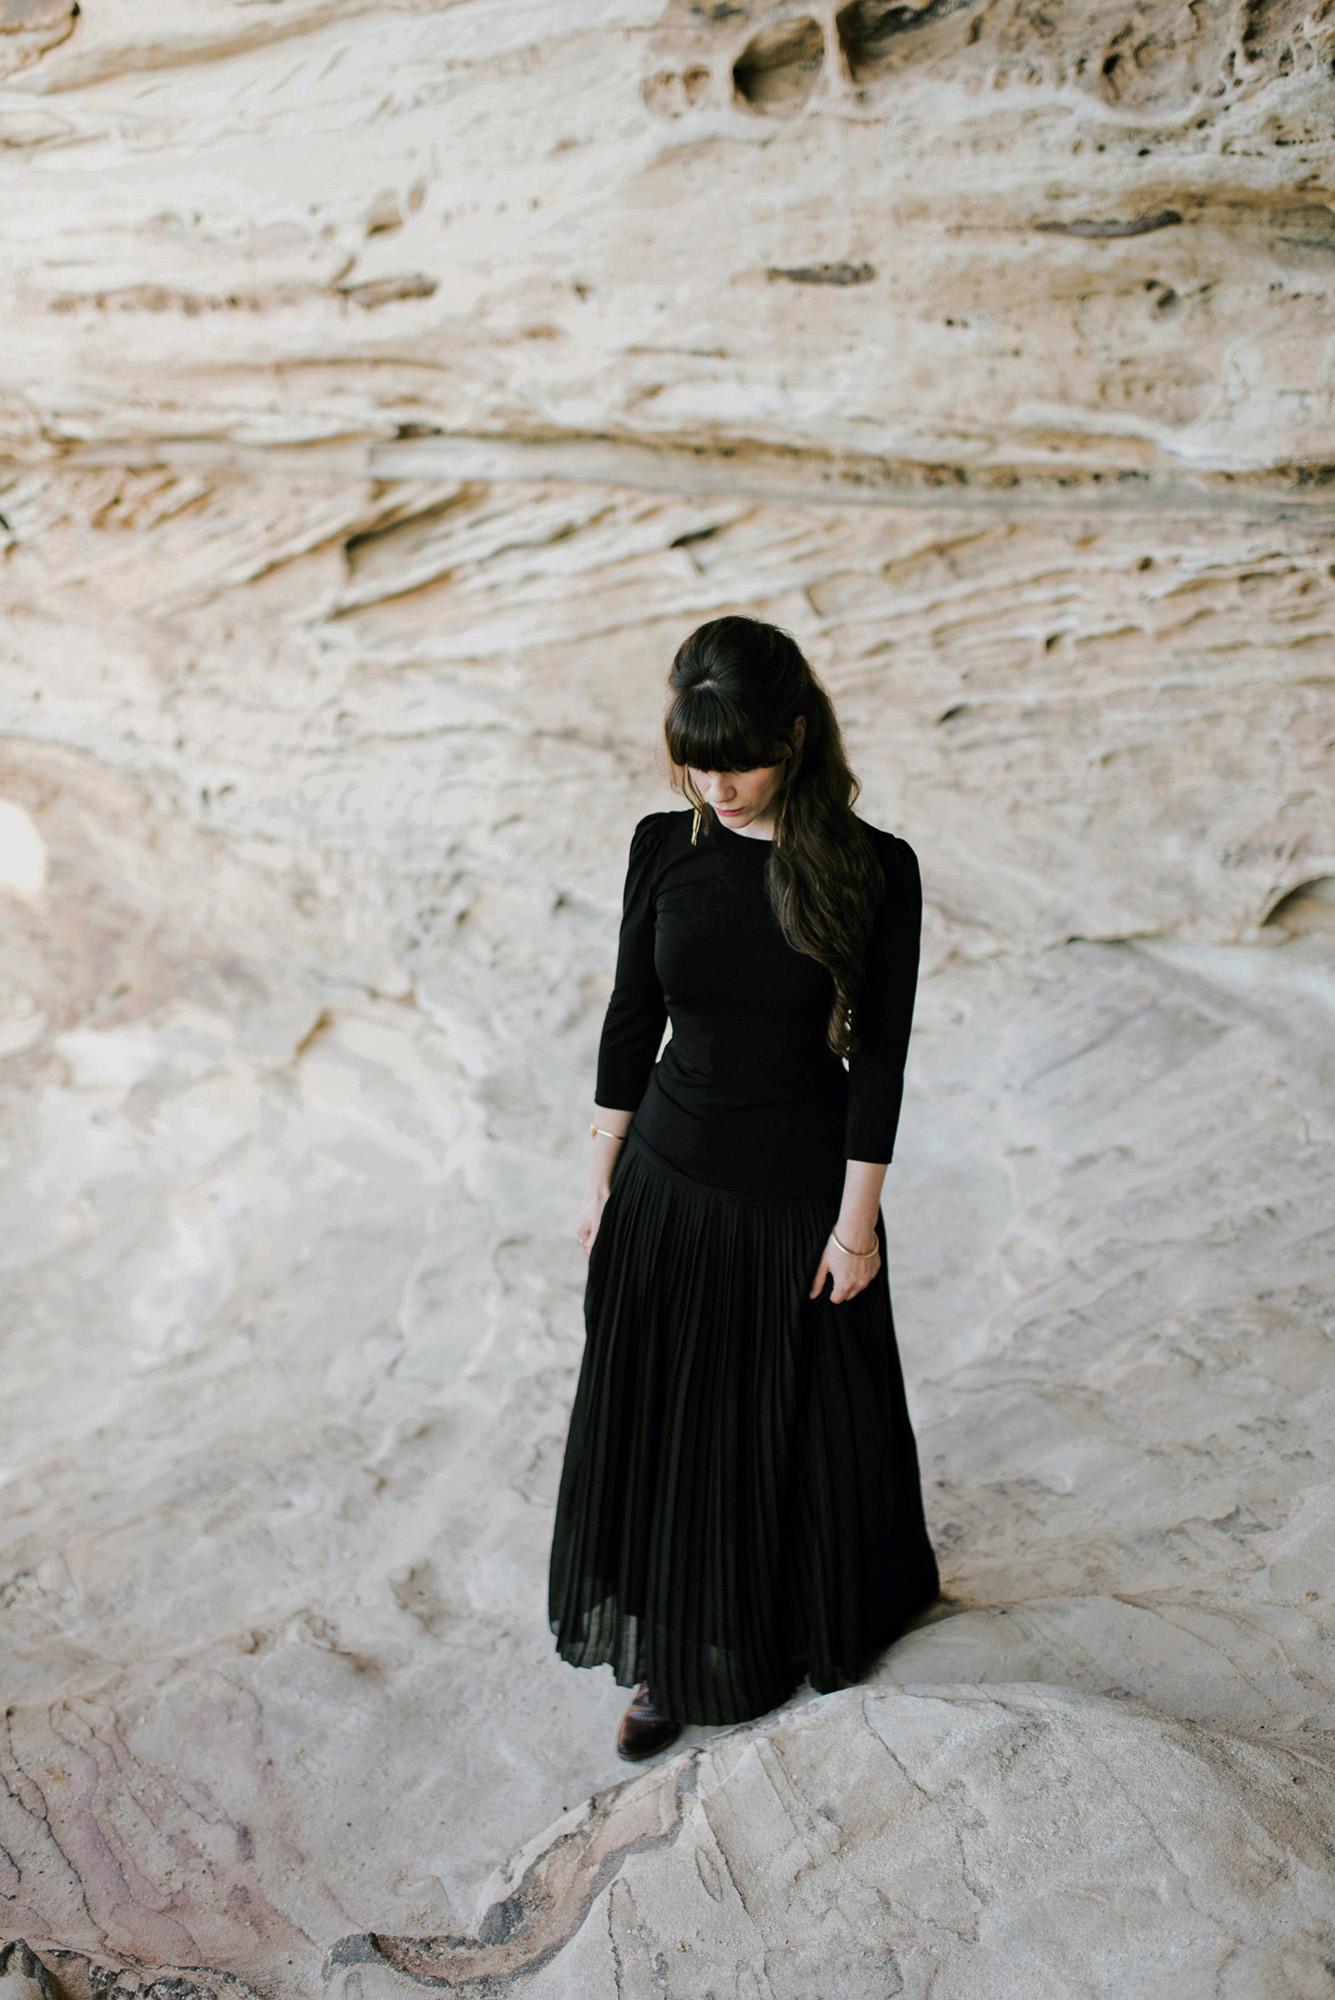 Photography by Ona Janzen